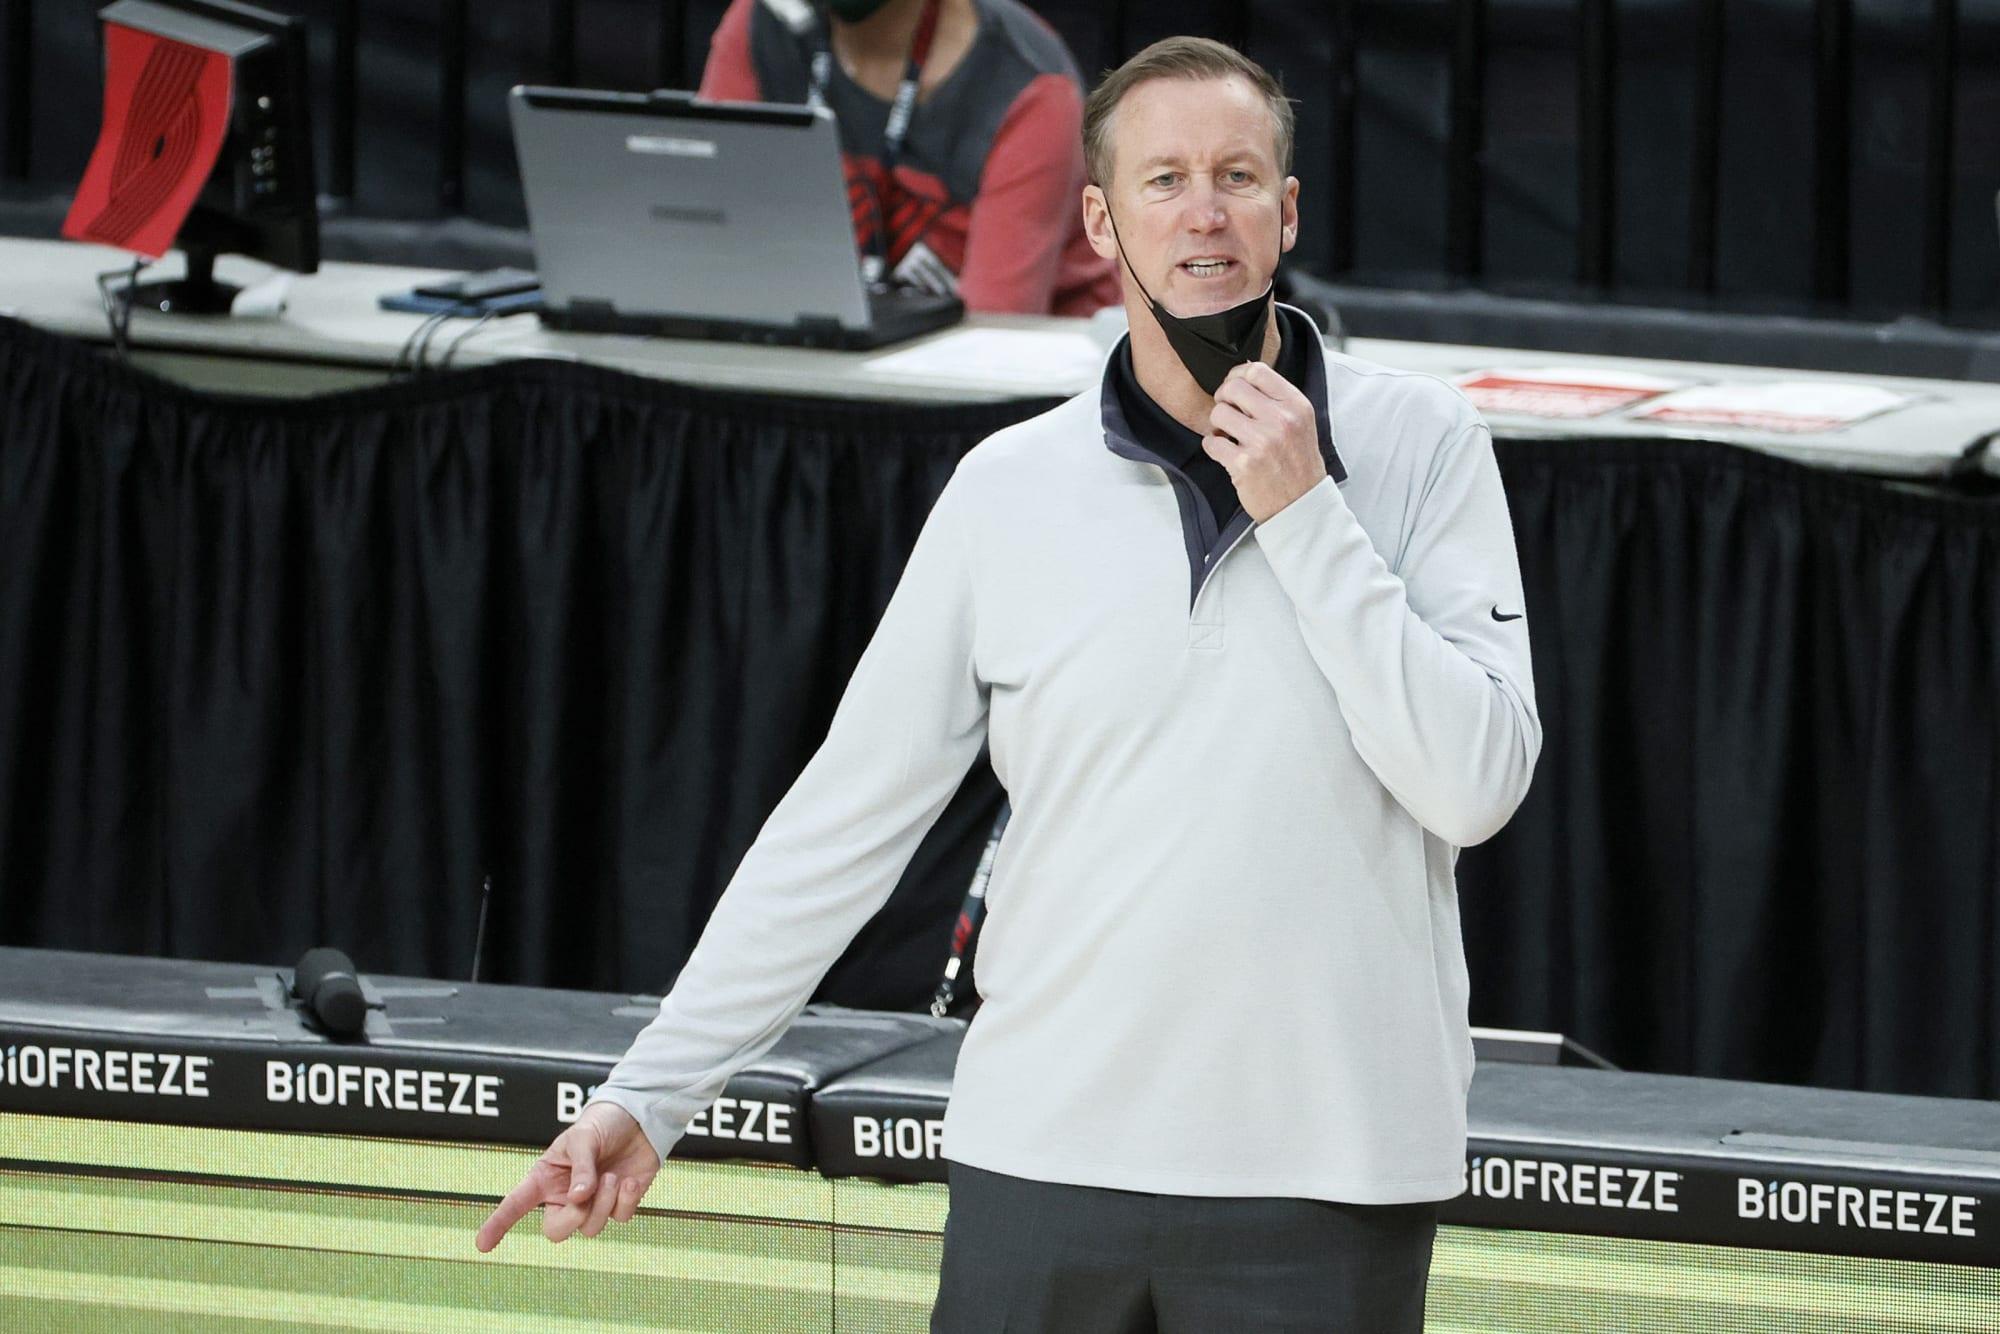 Toronto Raptors should hire Terry Stotts as an assistant after Portland exit